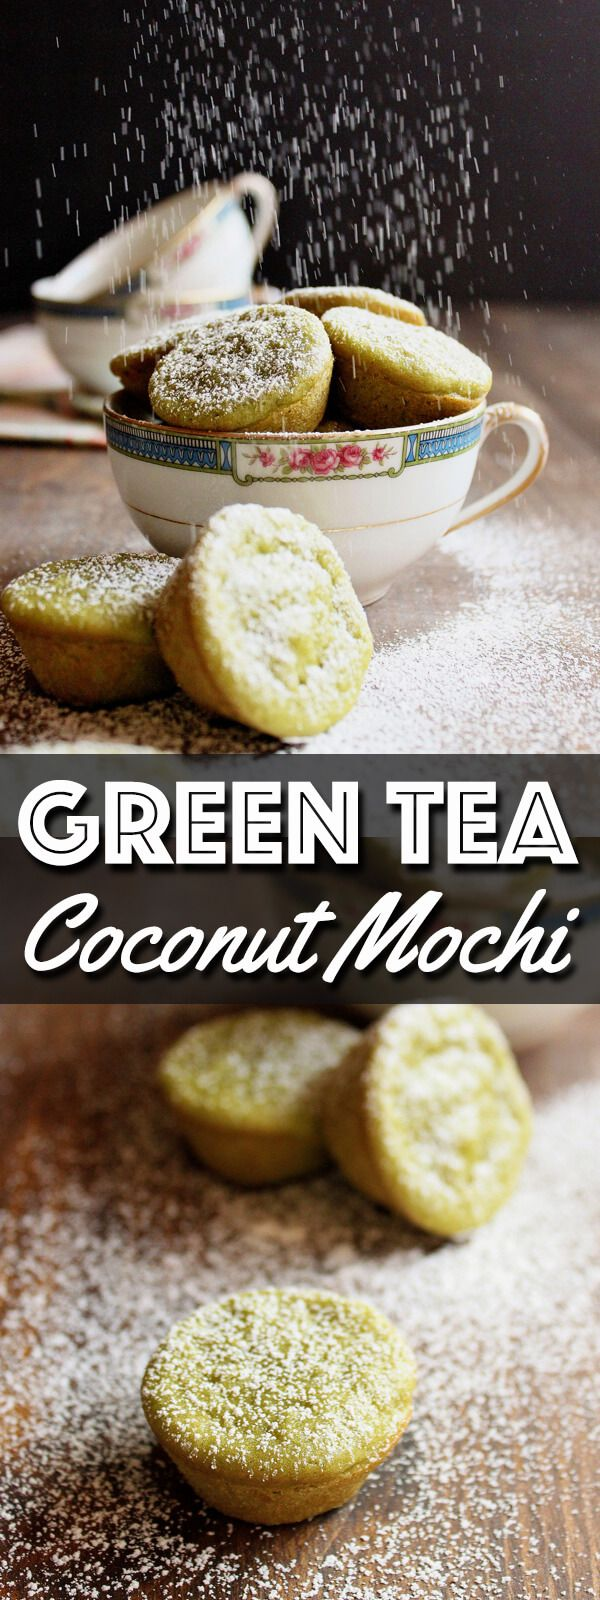 Photo of Matcha Green Tea Coconut Mochi